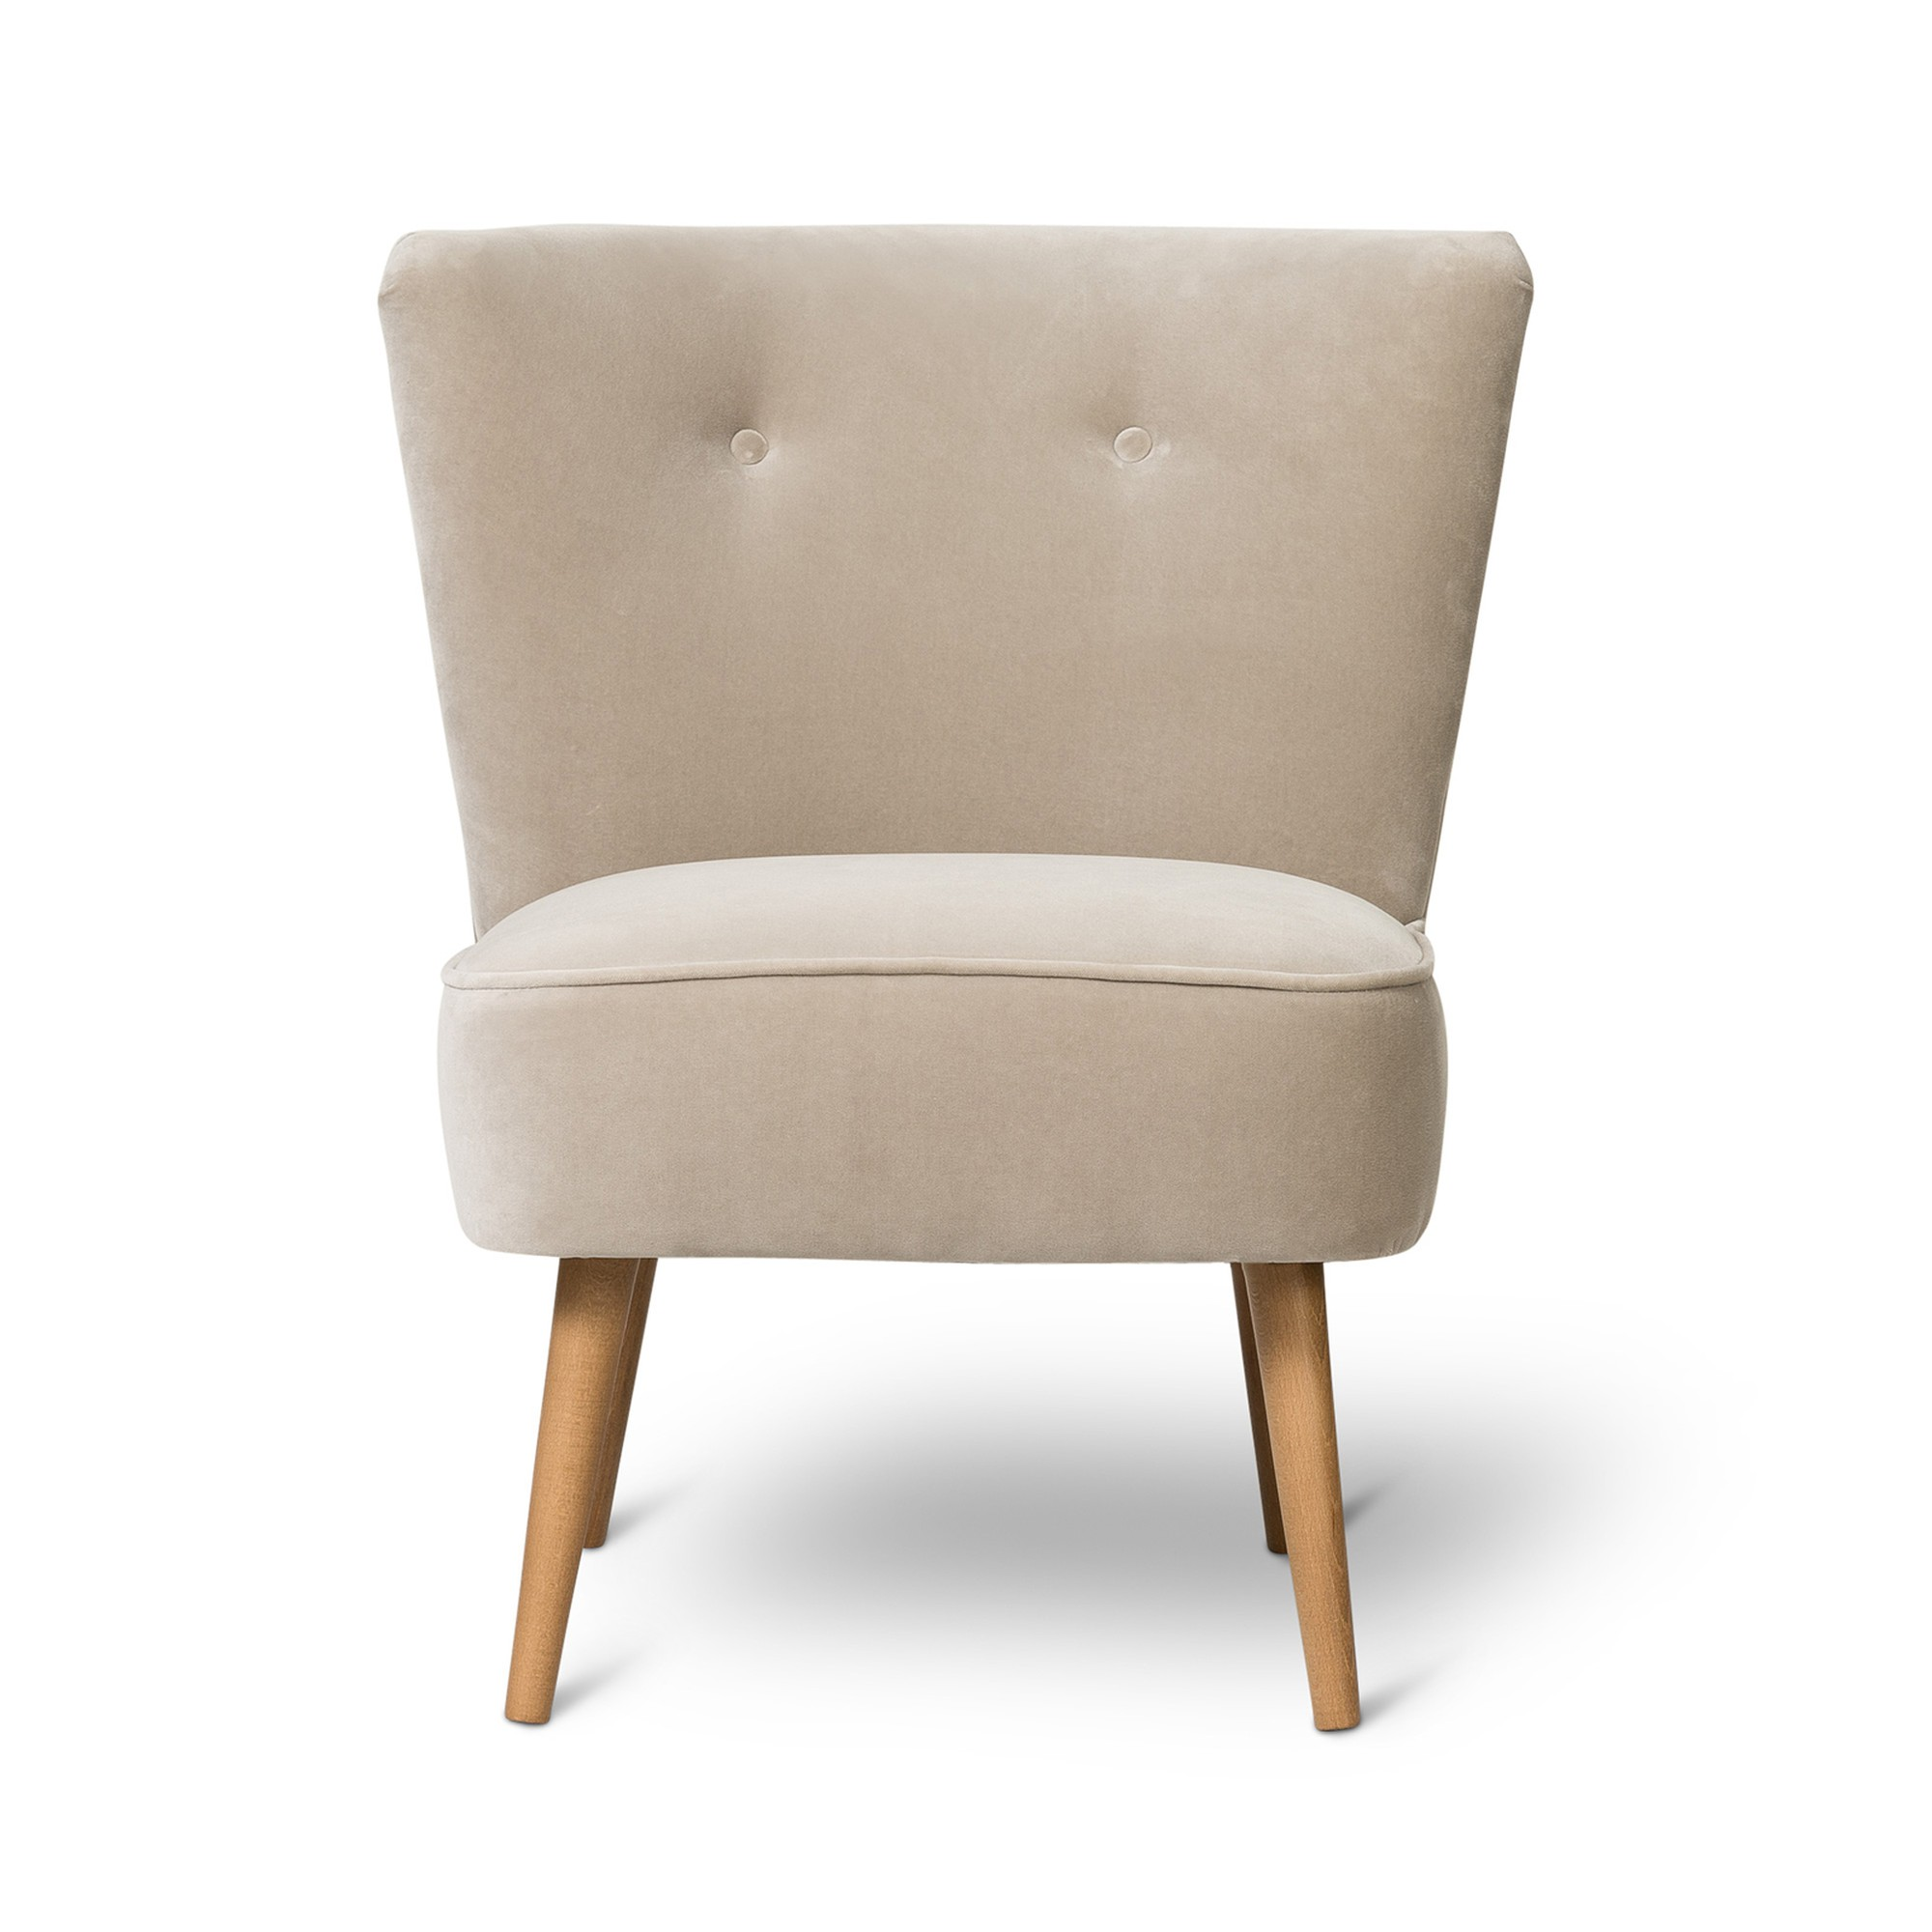 Le Cocktail Velvet Chair